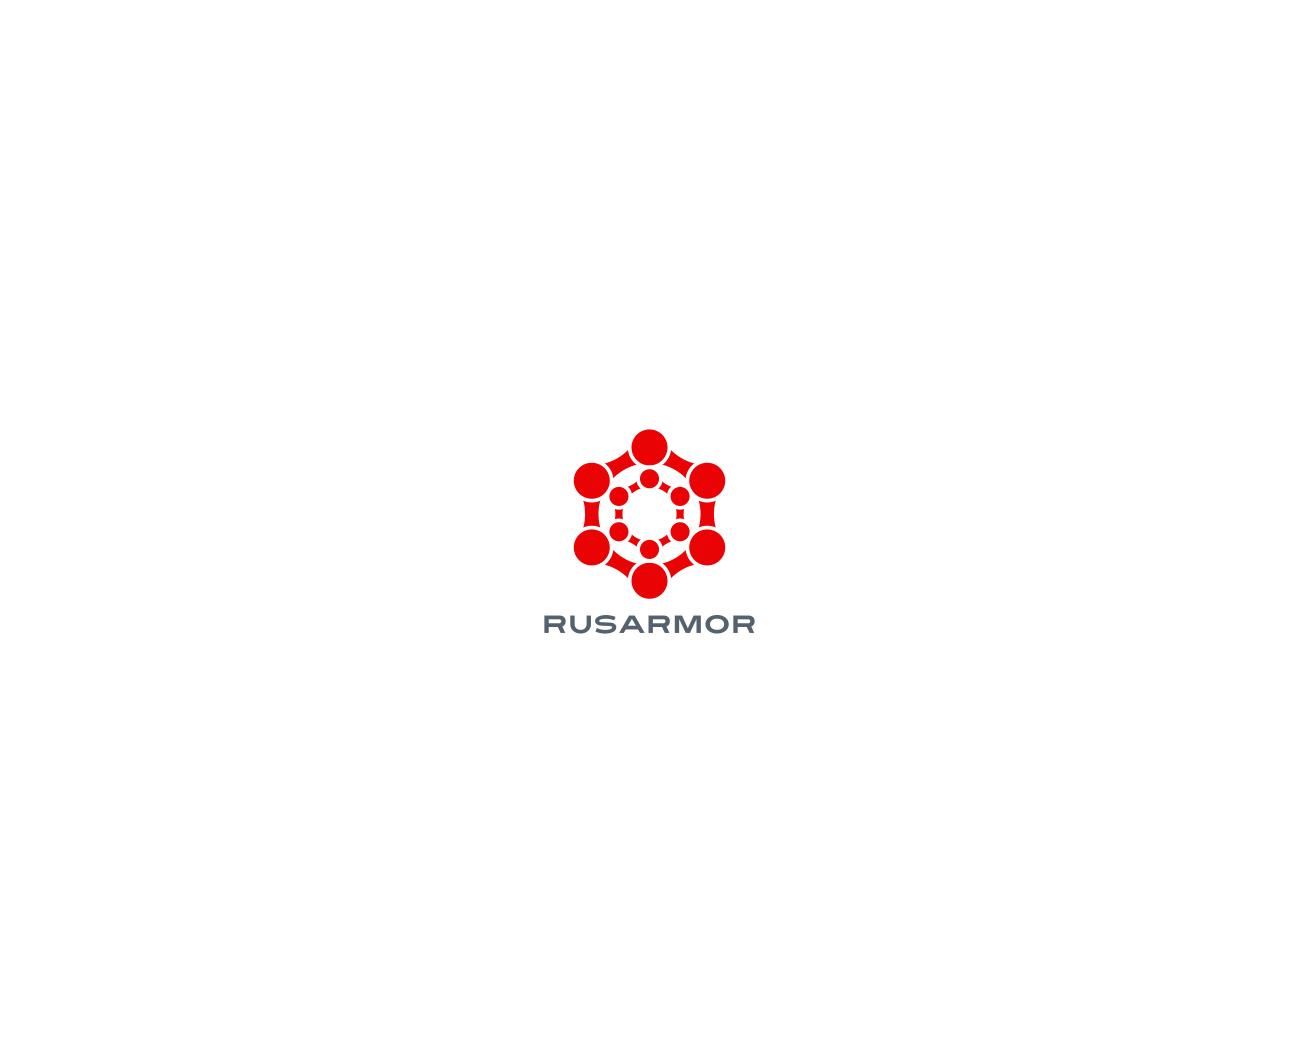 Разработка логотипа технологического стартапа РУСАРМОР фото f_3685a0e2067ce412.png